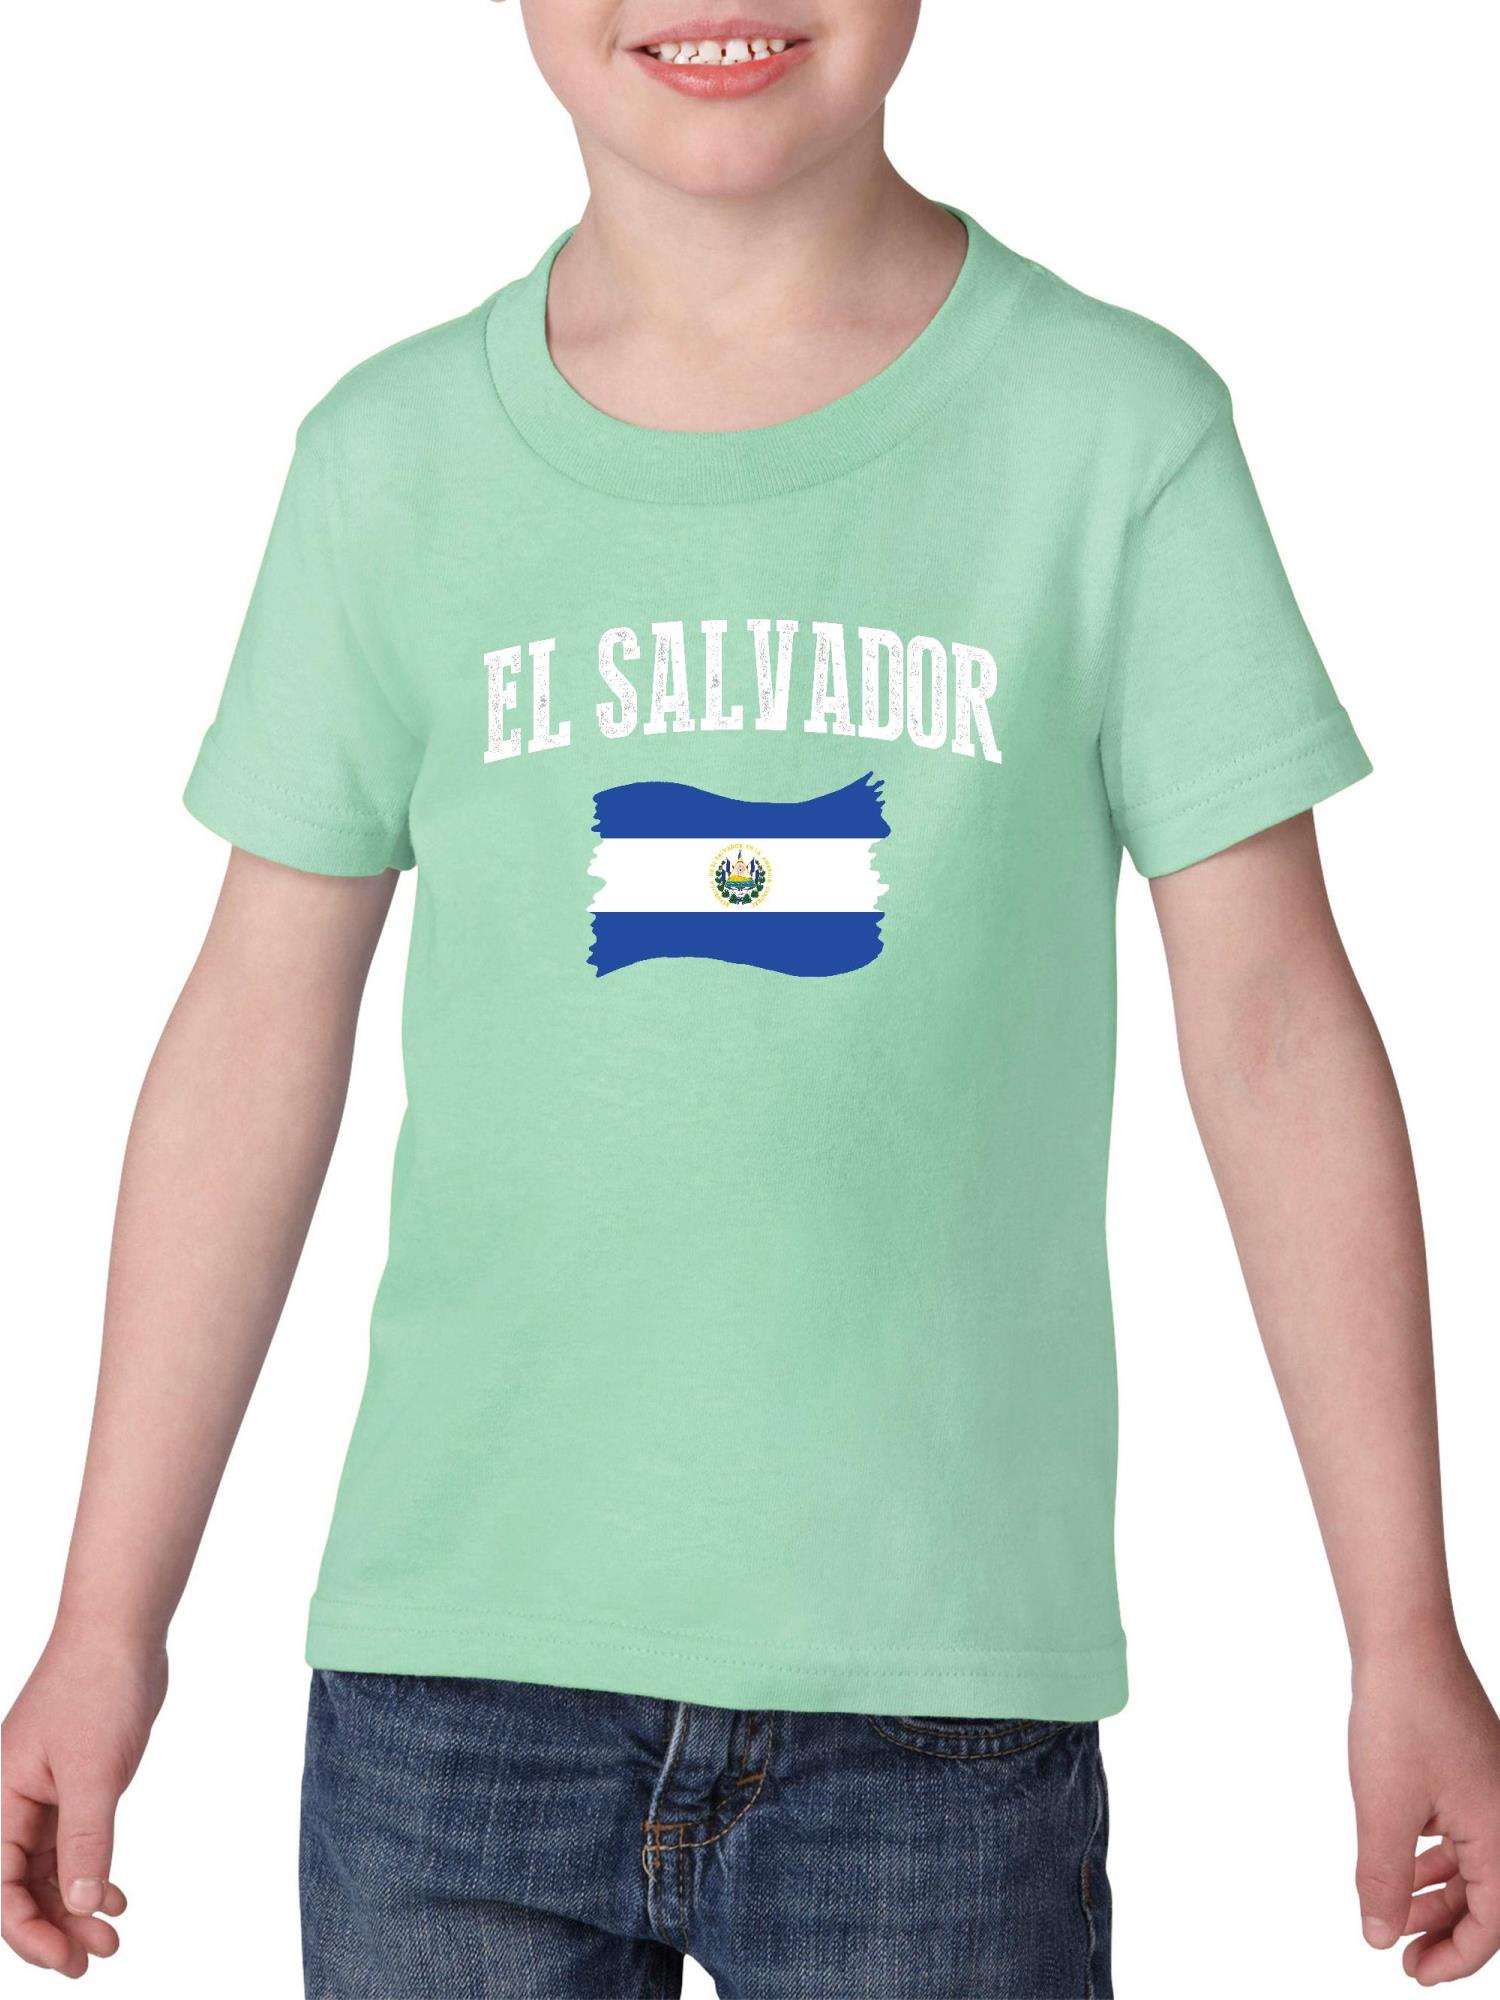 El Salvador Heavy Cotton Toddler Kids T-Shirt Tee Clothing